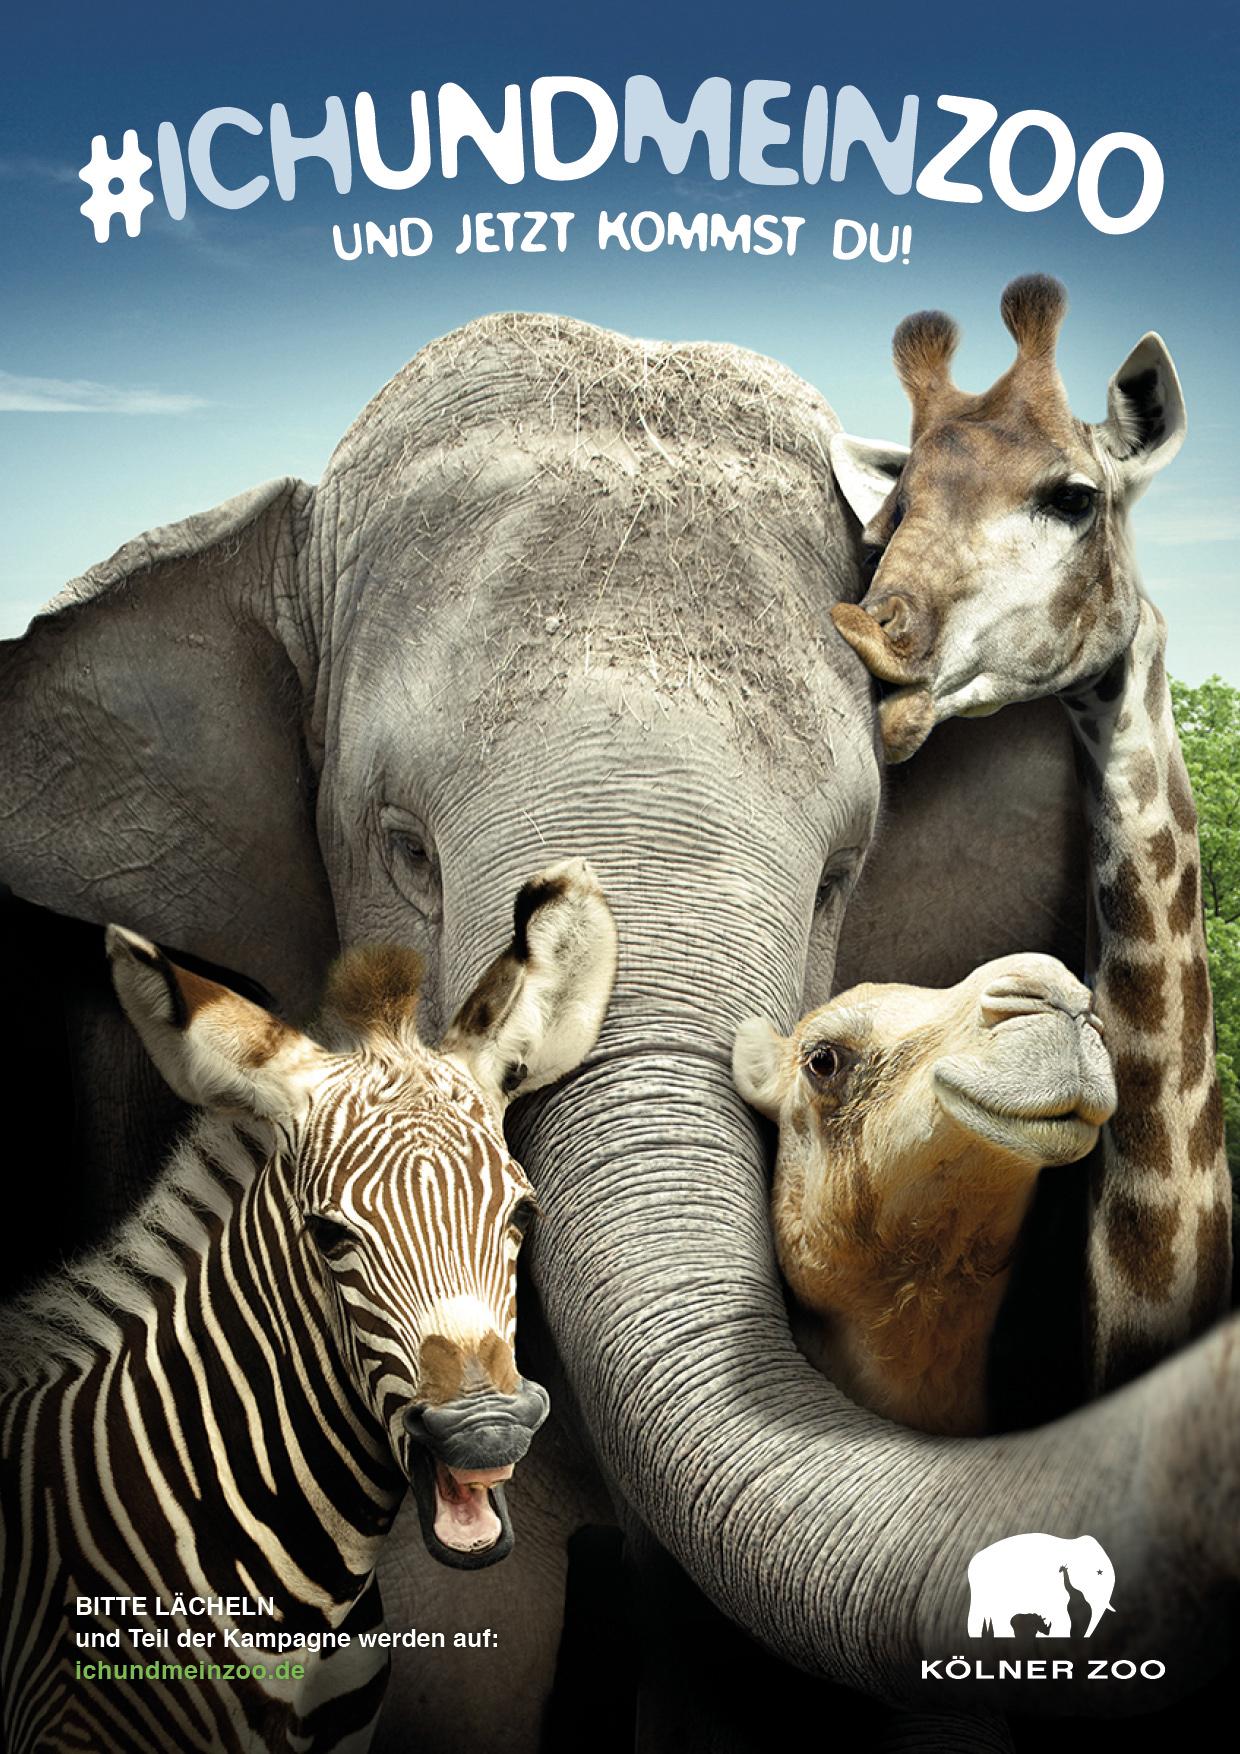 Klner Zoo PREUSS UND PREUSS